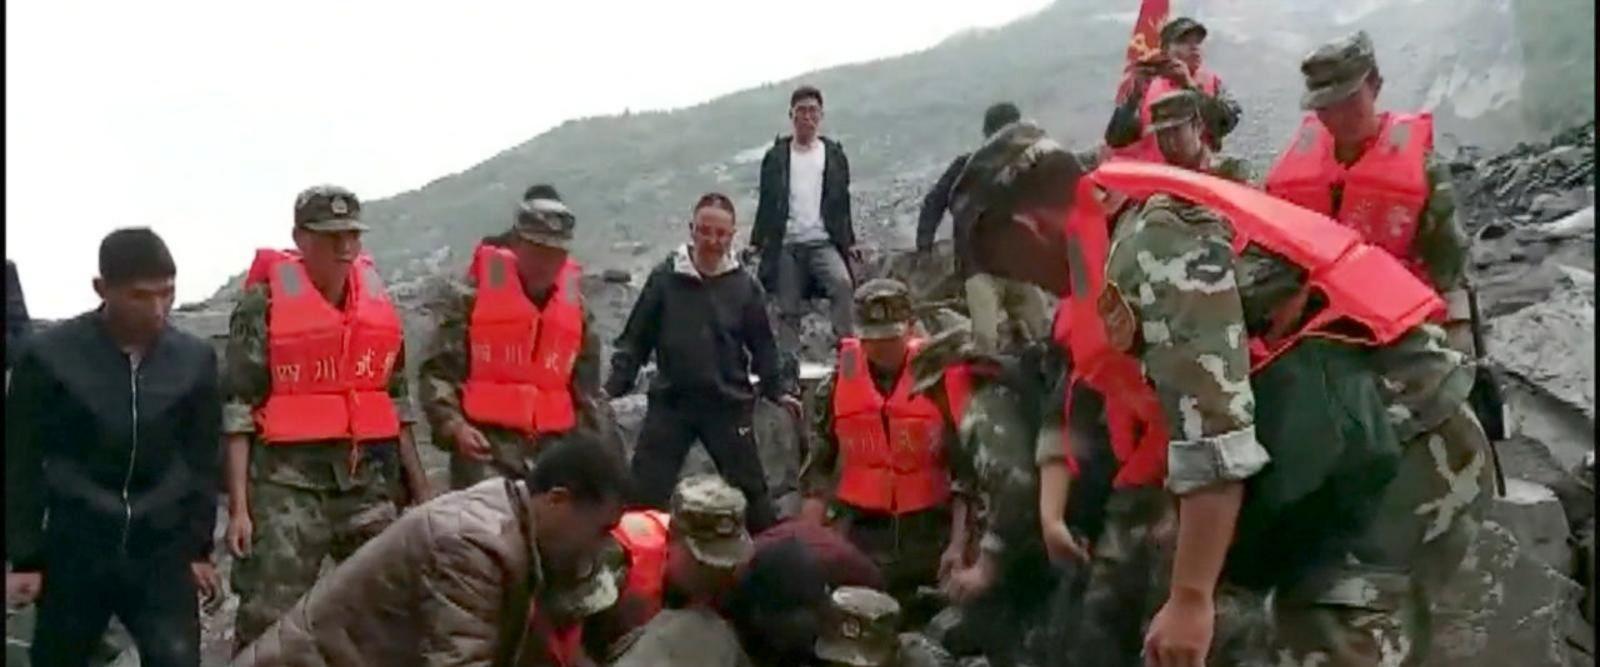 VIDEO: Desperate search for landslide survivors in China